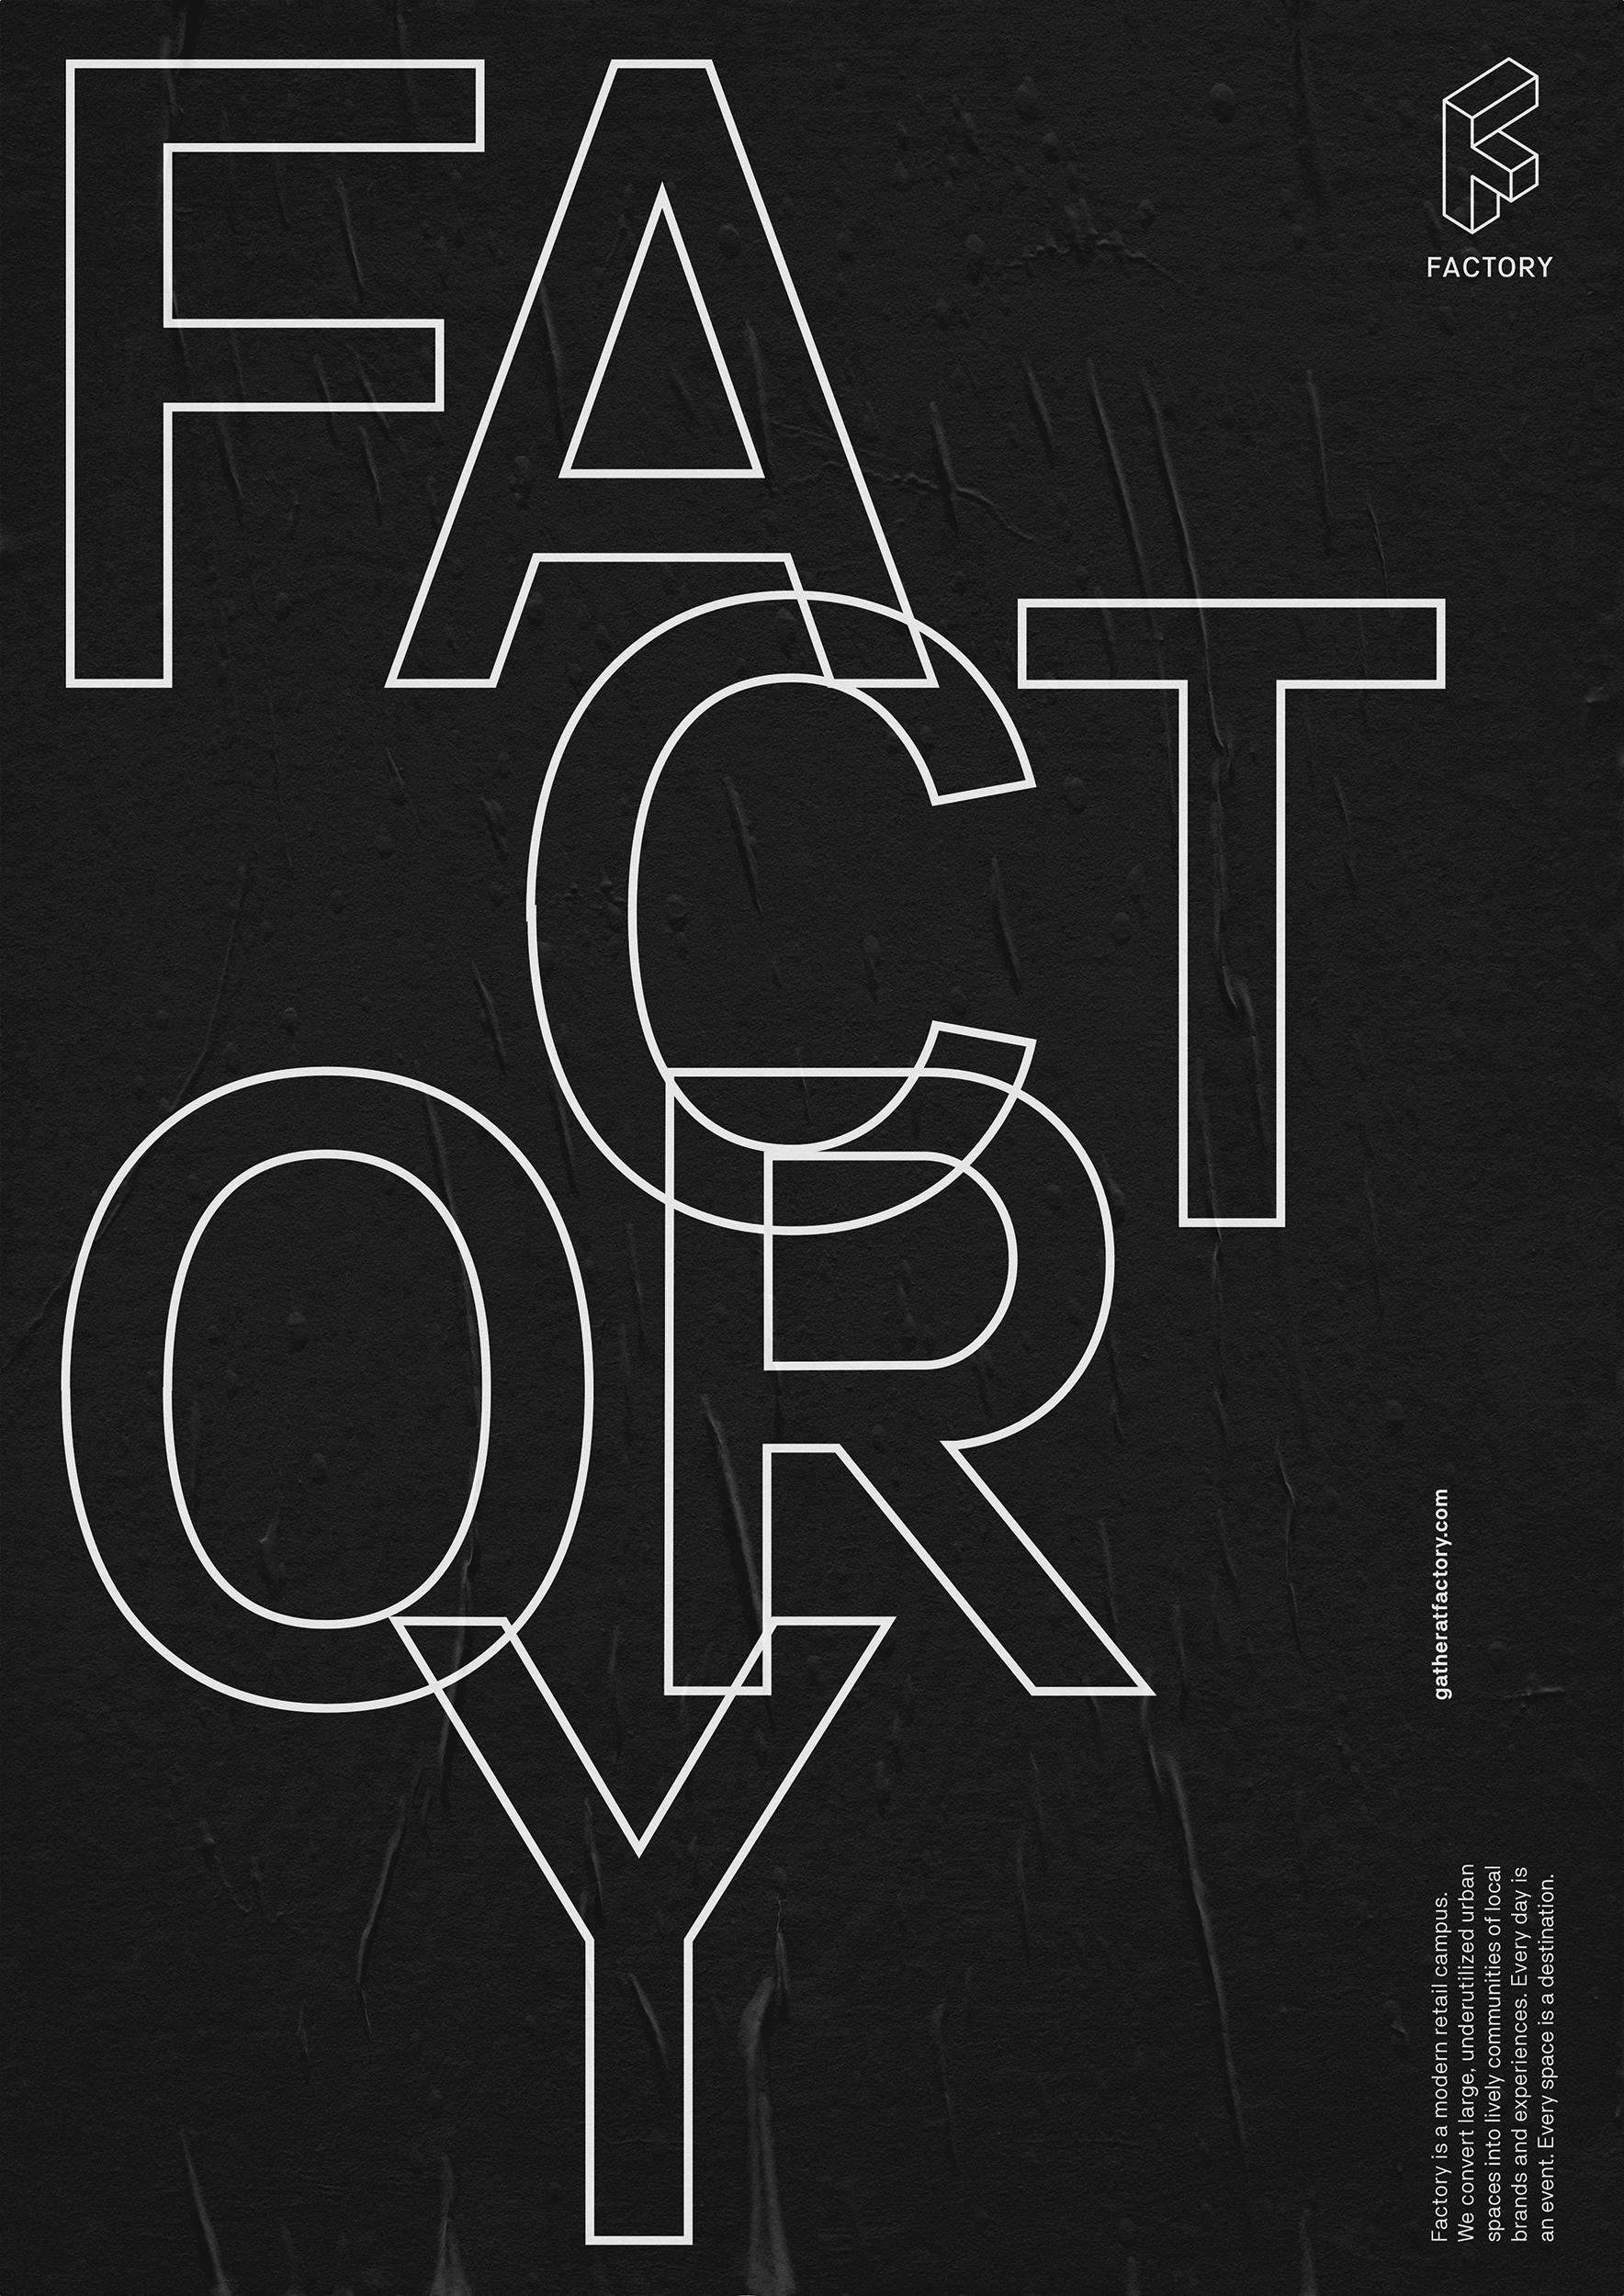 JK_Factory_Poster_1.jpg